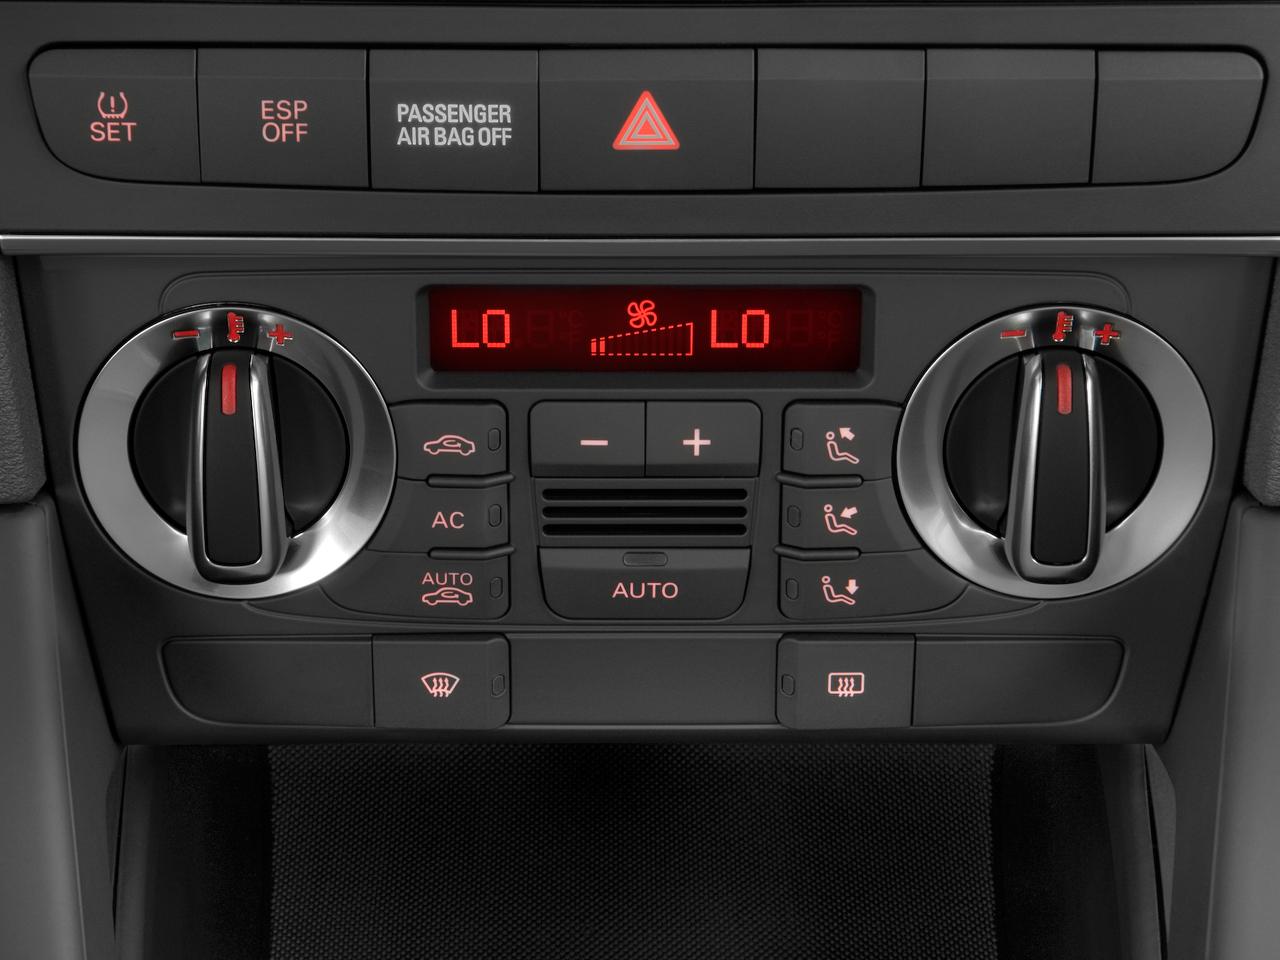 2009 audi a3 2 0t quattro audi luxury wagon review automobile rh automobilemag com Audi A3 Service Manual Audi A3 V6